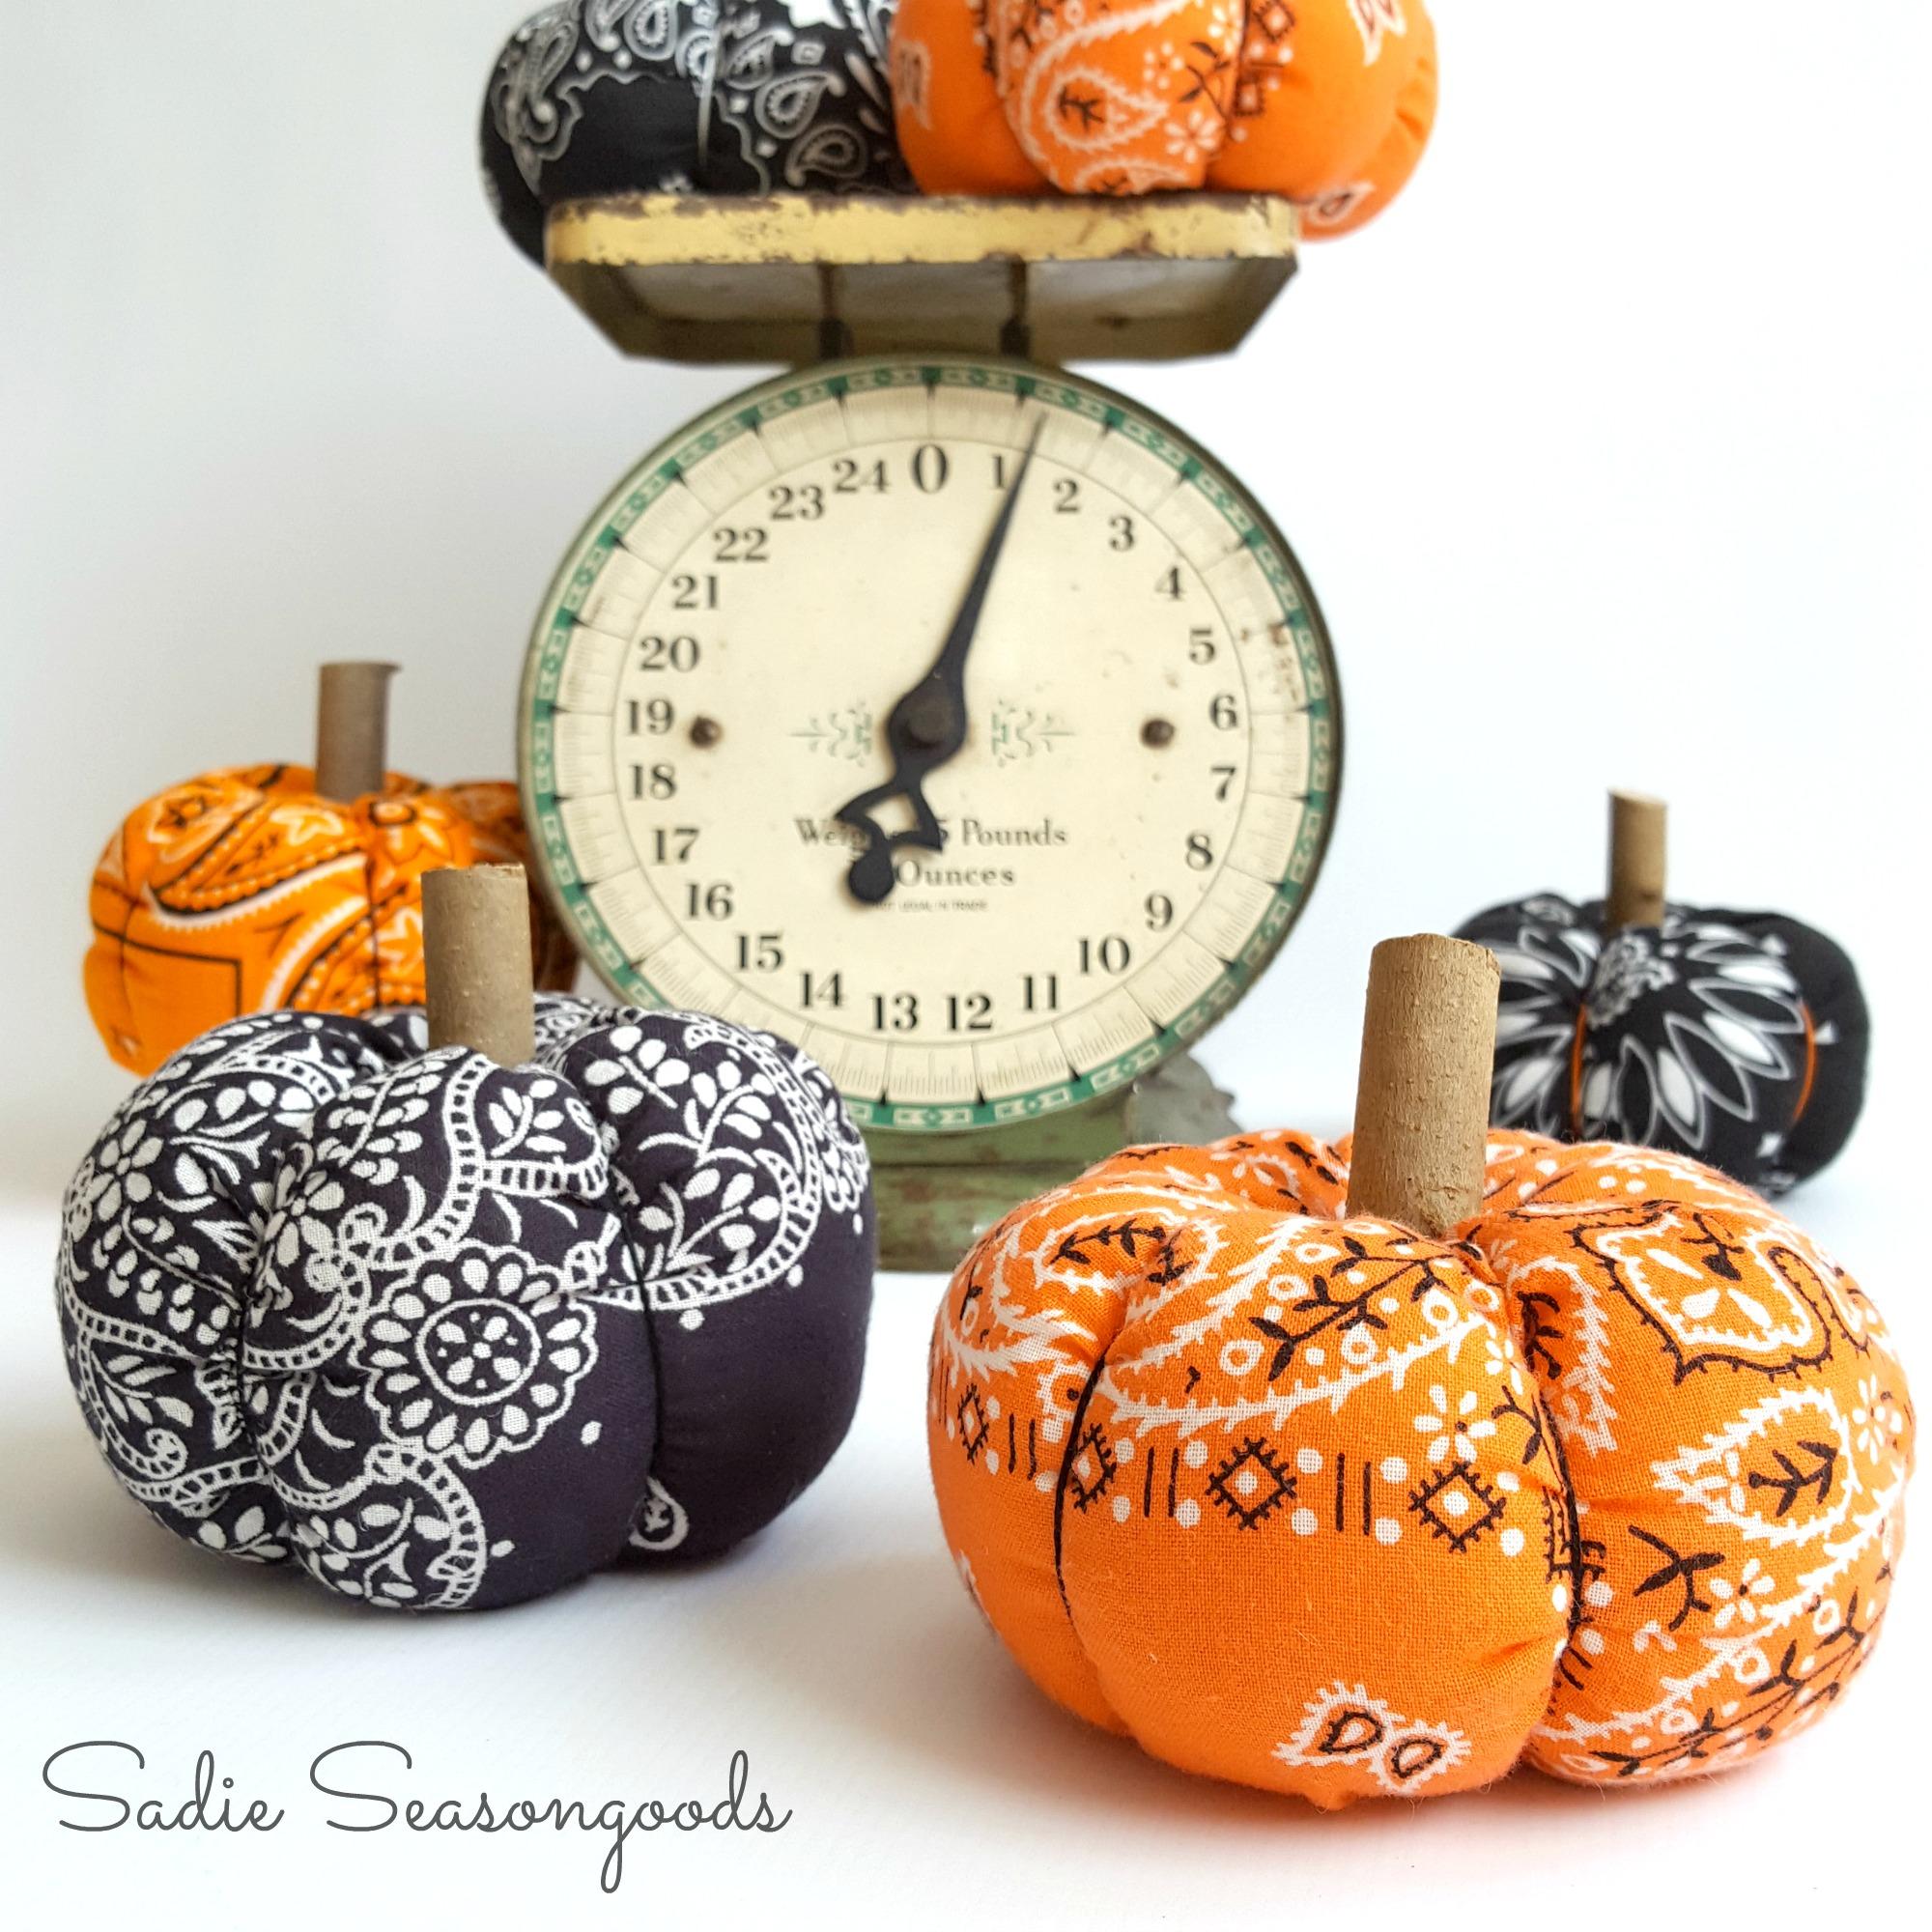 DIY bandana fall pumpkins, by Sadie Seasongoods, featured on Funky Junk Interiors